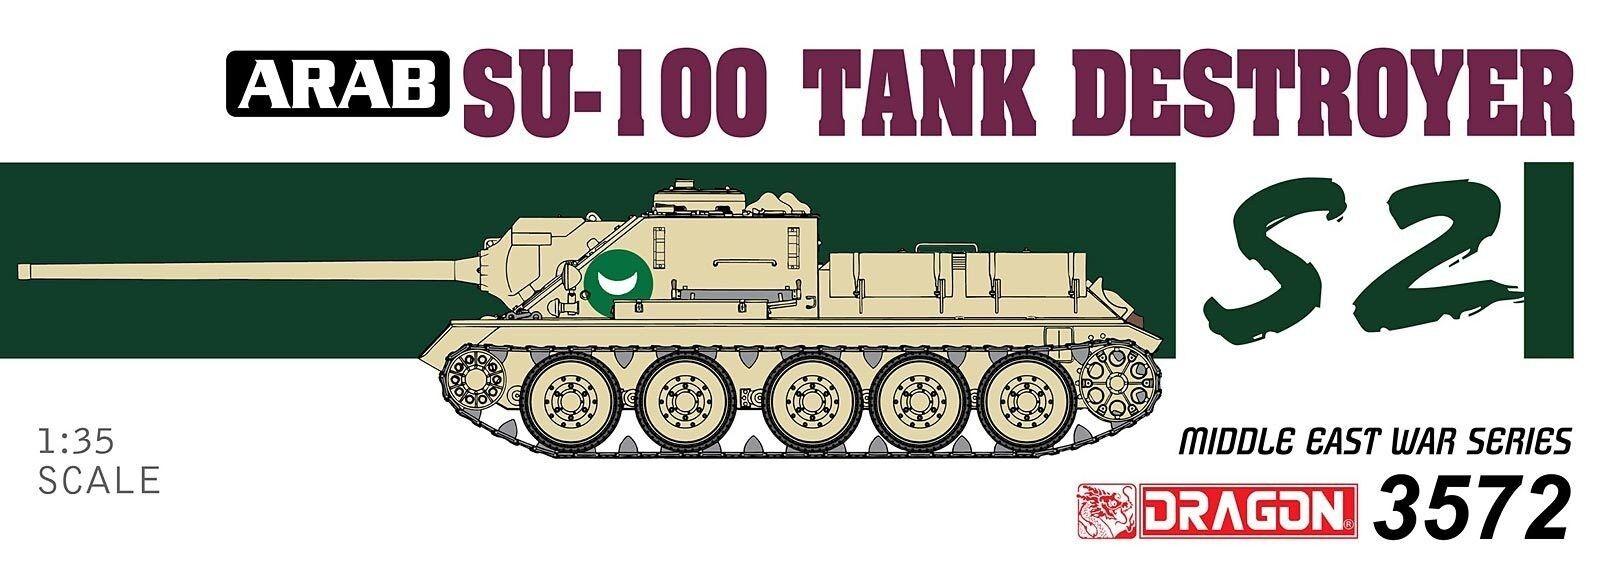 Dragon 1 3 5 3572  Egyptian SU-100 Tank Destroyer- The Six Day War